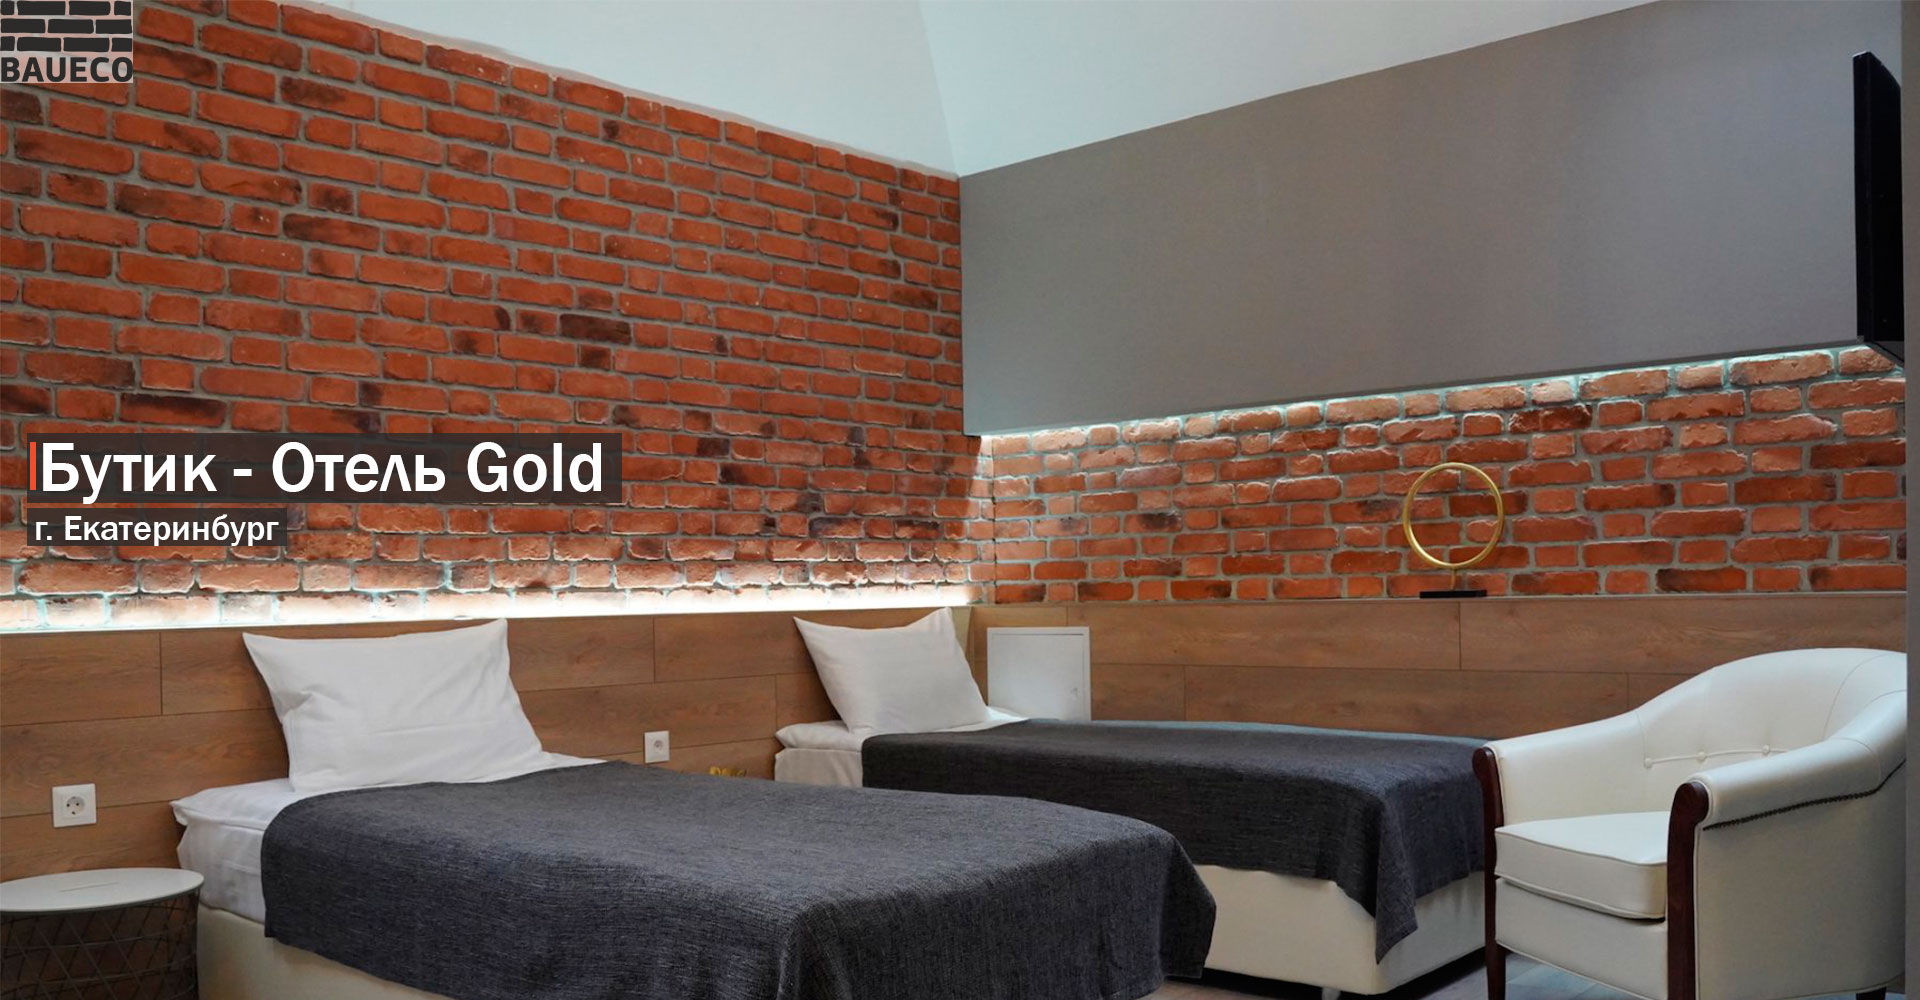 Отель бутик Gold декоративный кирпич БауЭко